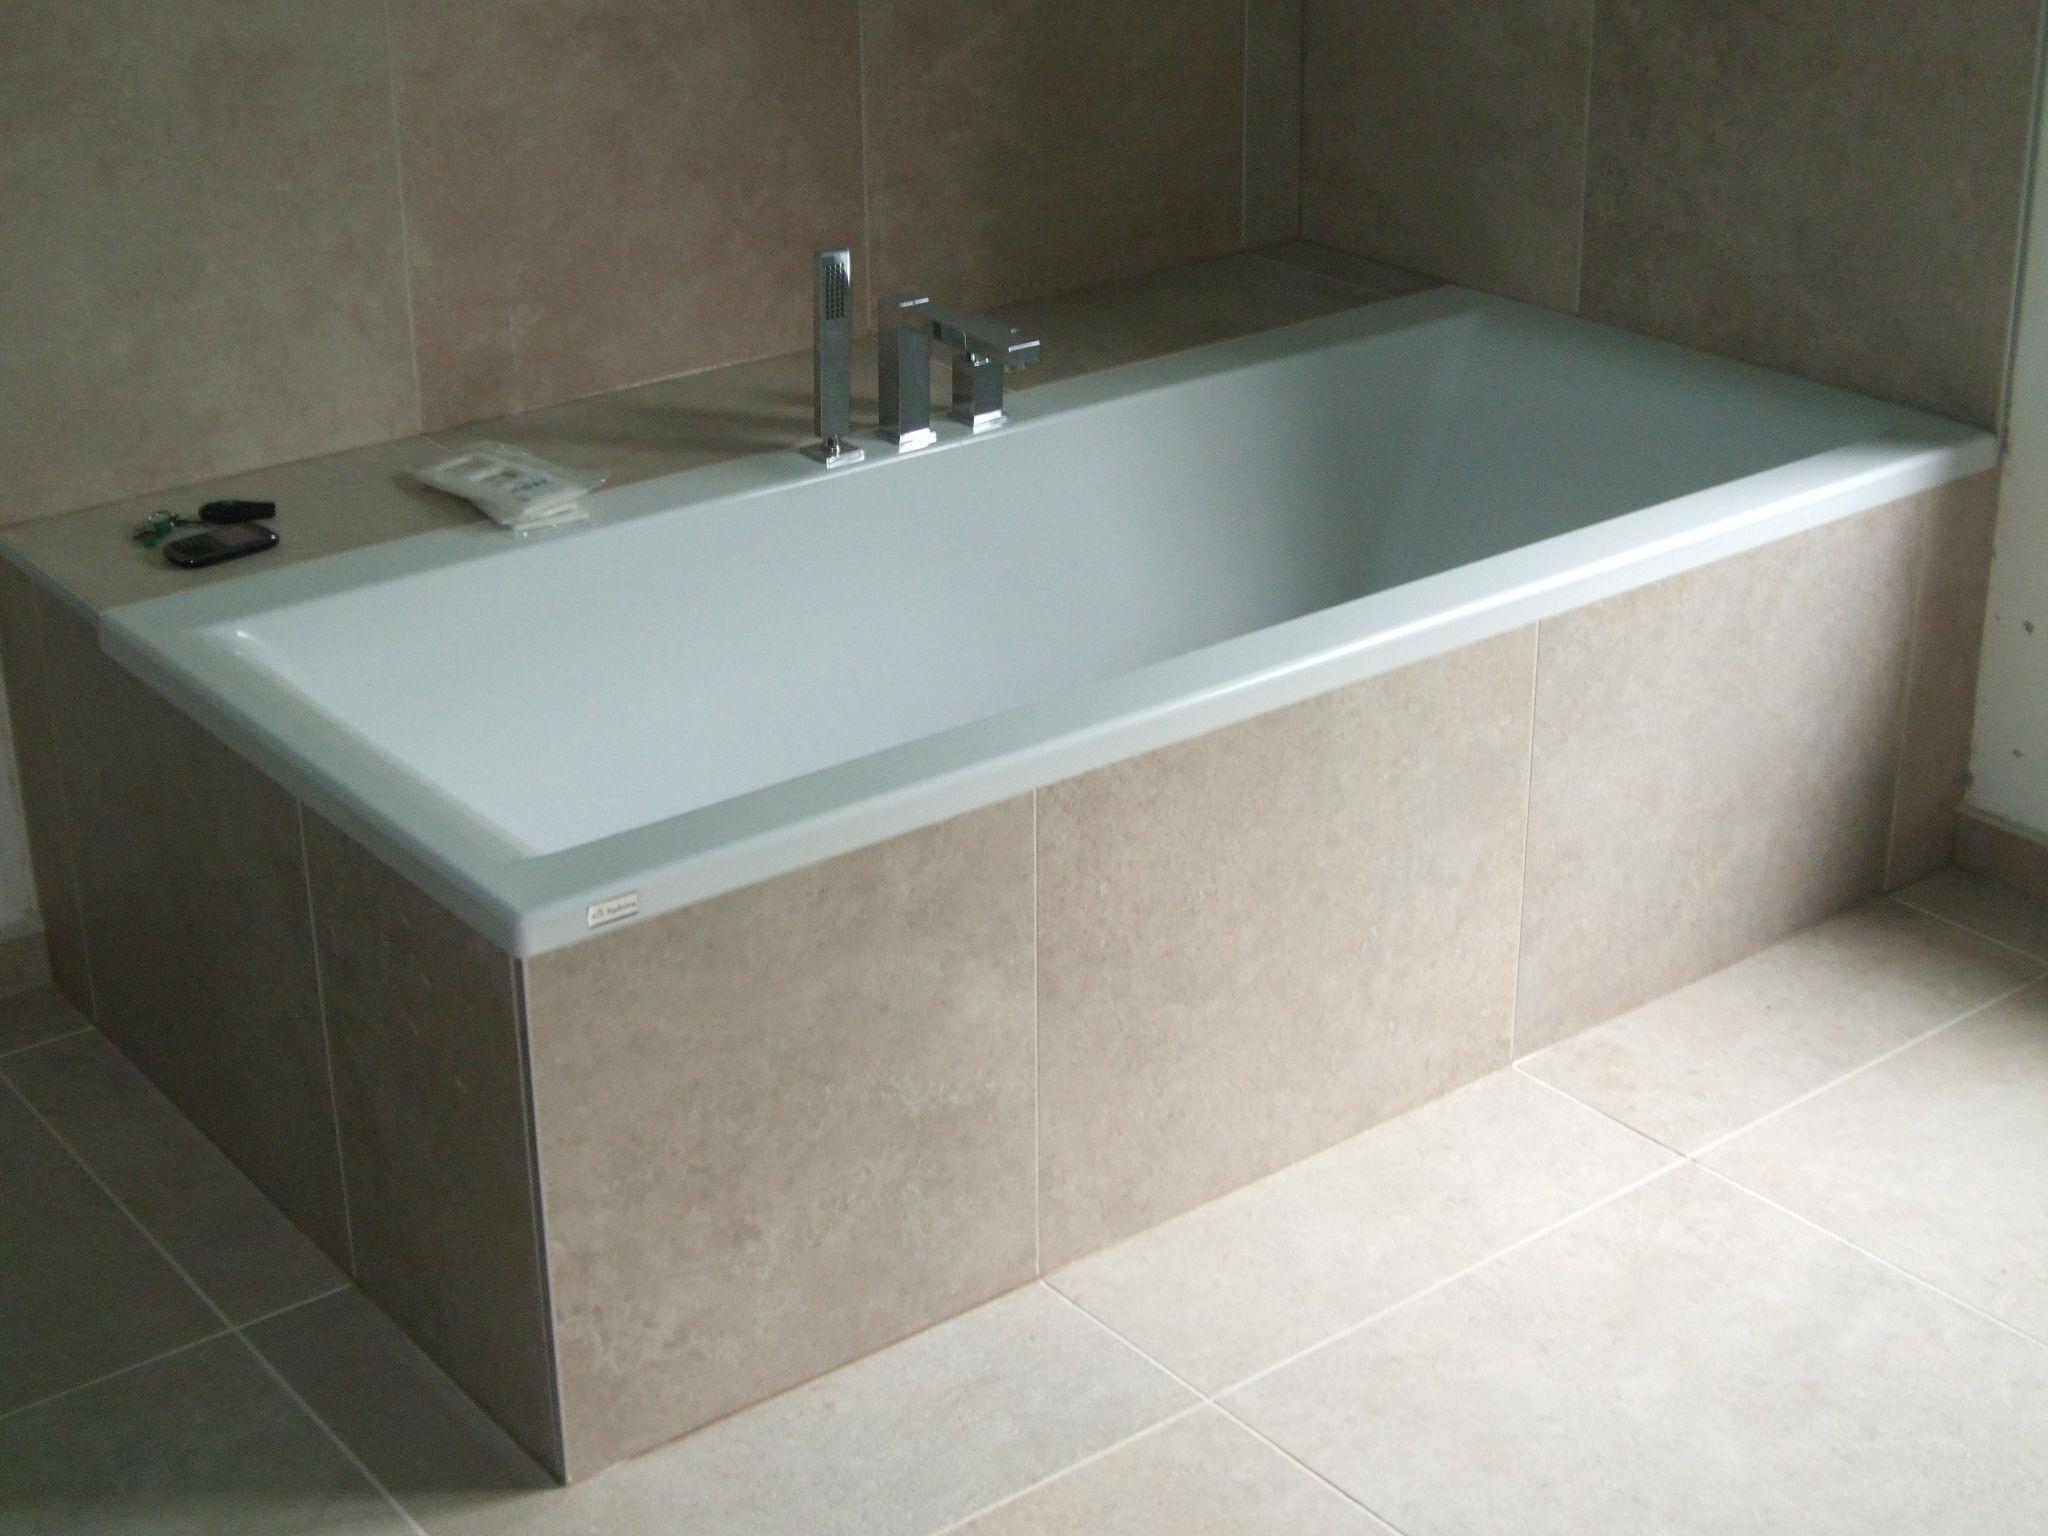 Bad afgewerkt met tegels badkraan op rand bad bad ideal standaard washpoint bad - Mat tegels ...